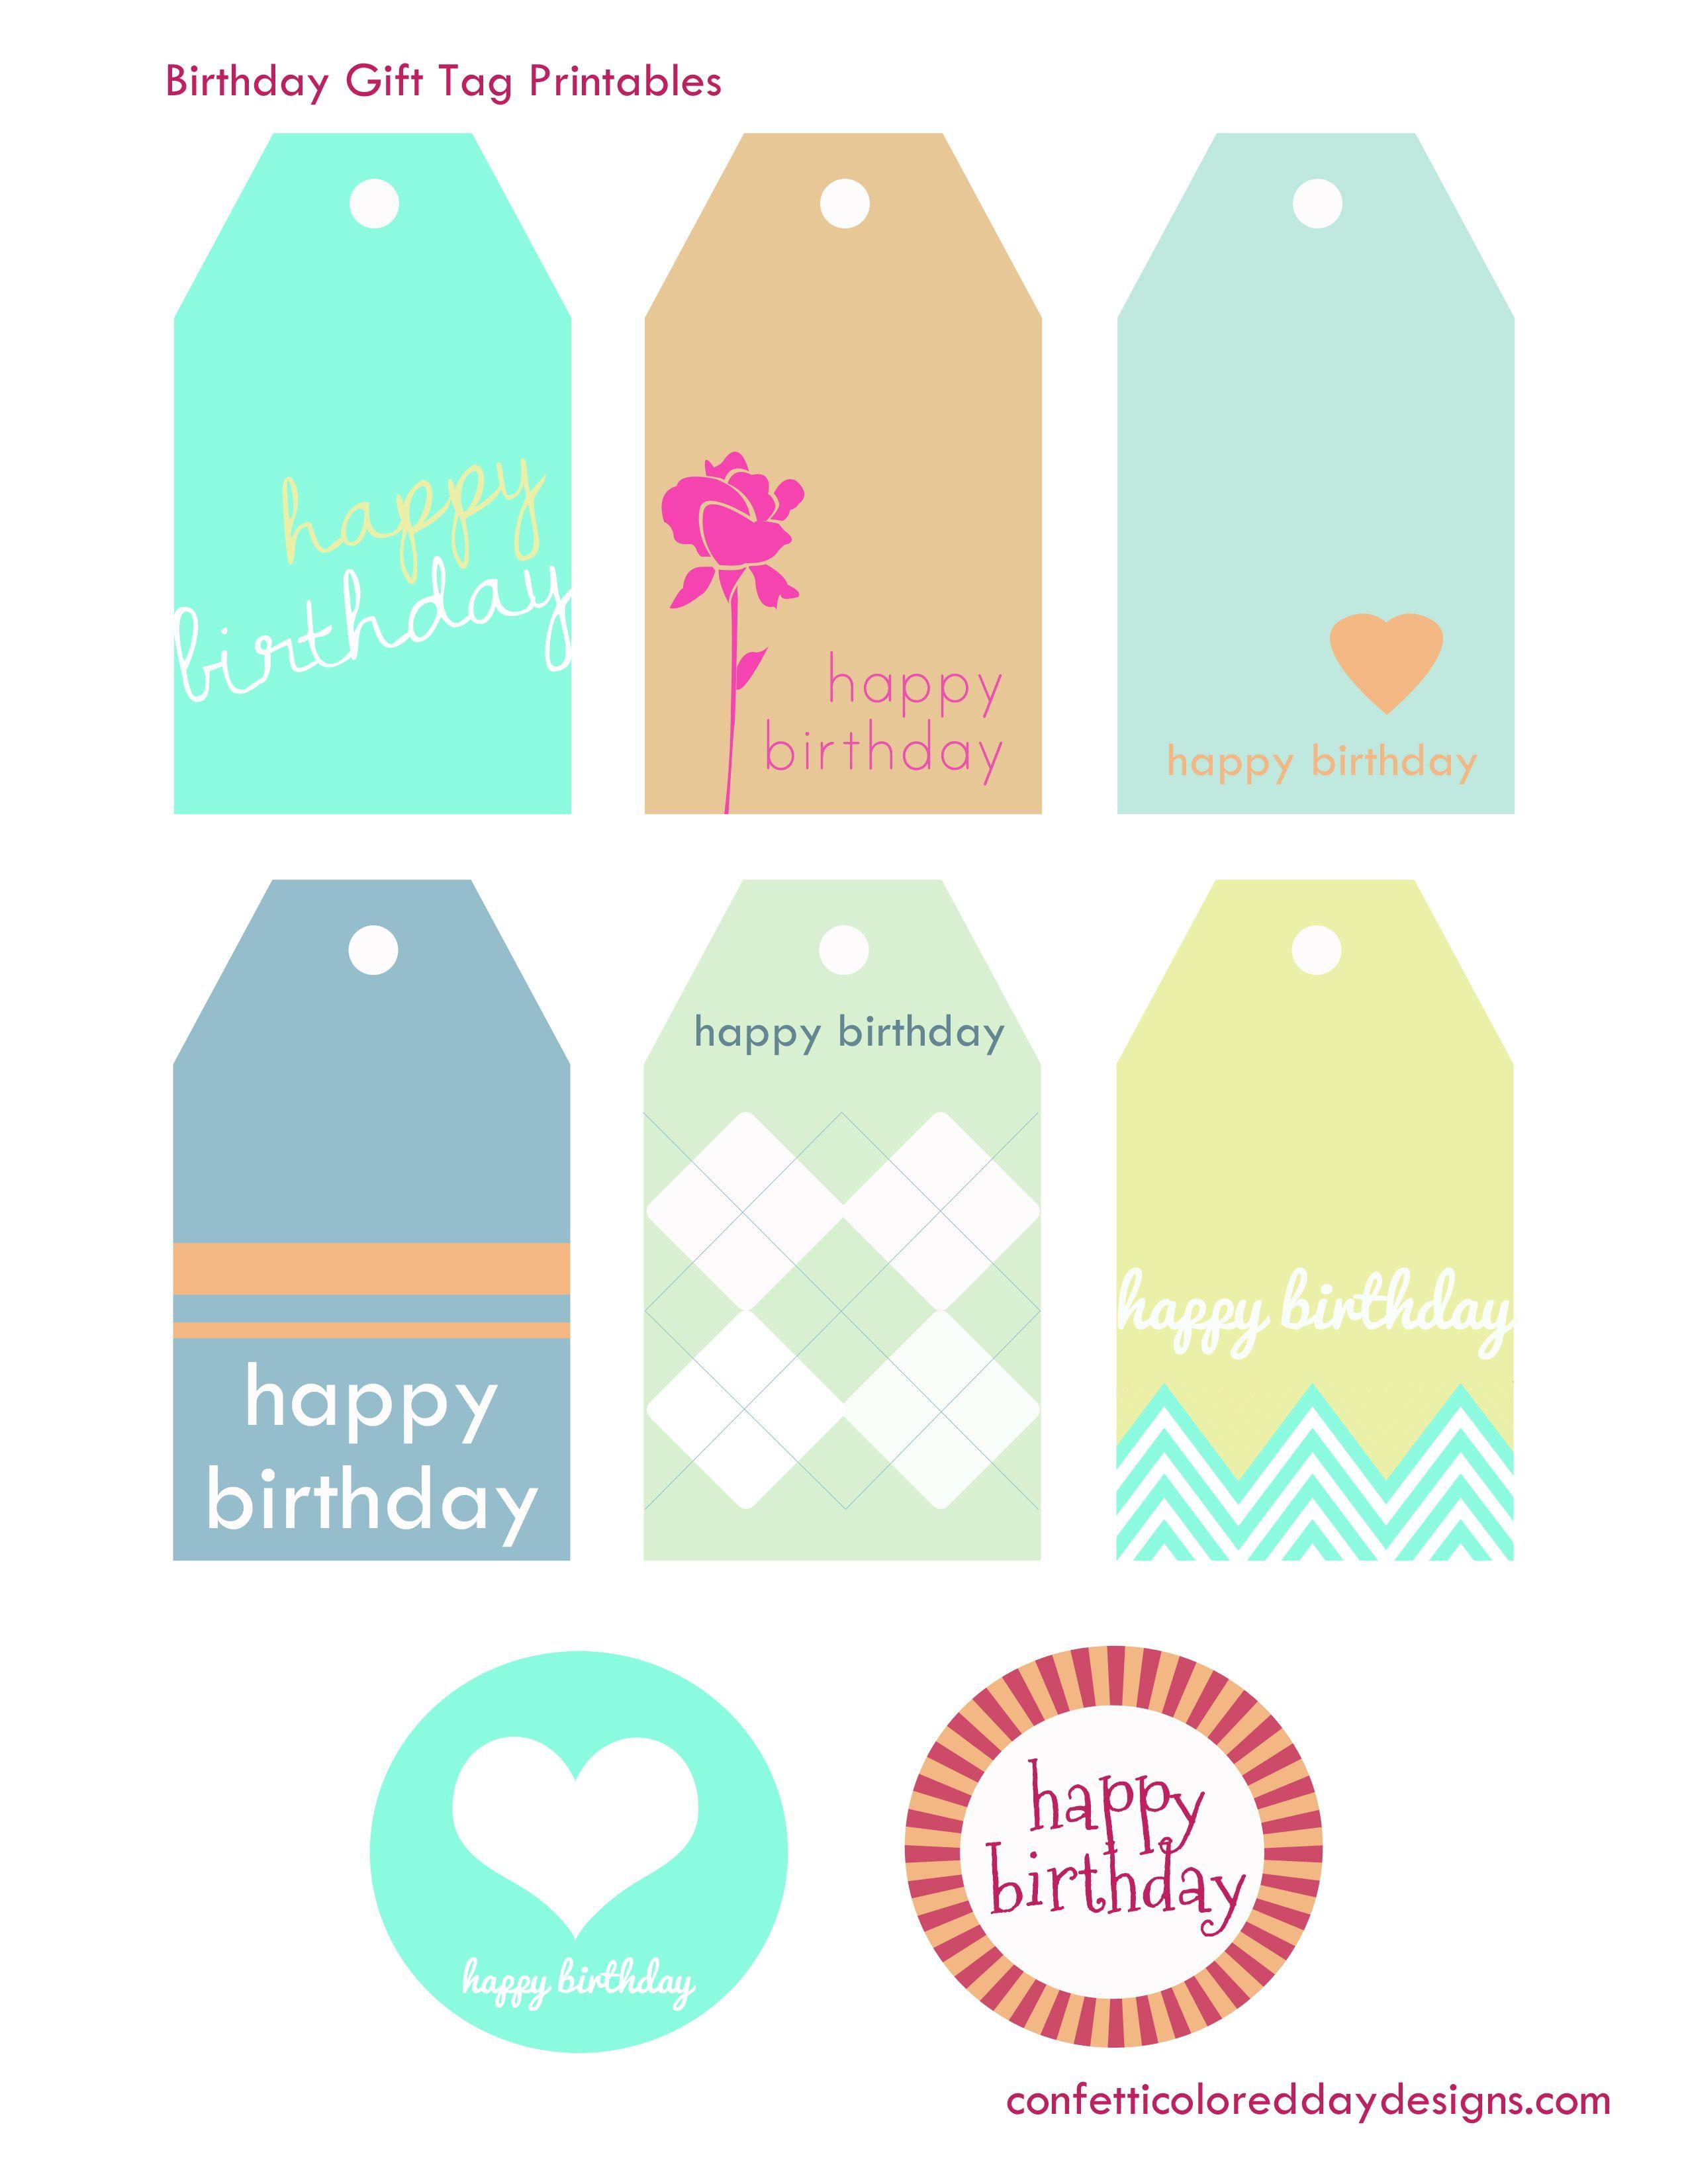 Birthday Invitation Archives | Confetti Colored Day Designs - Free Printable Birthday Tags